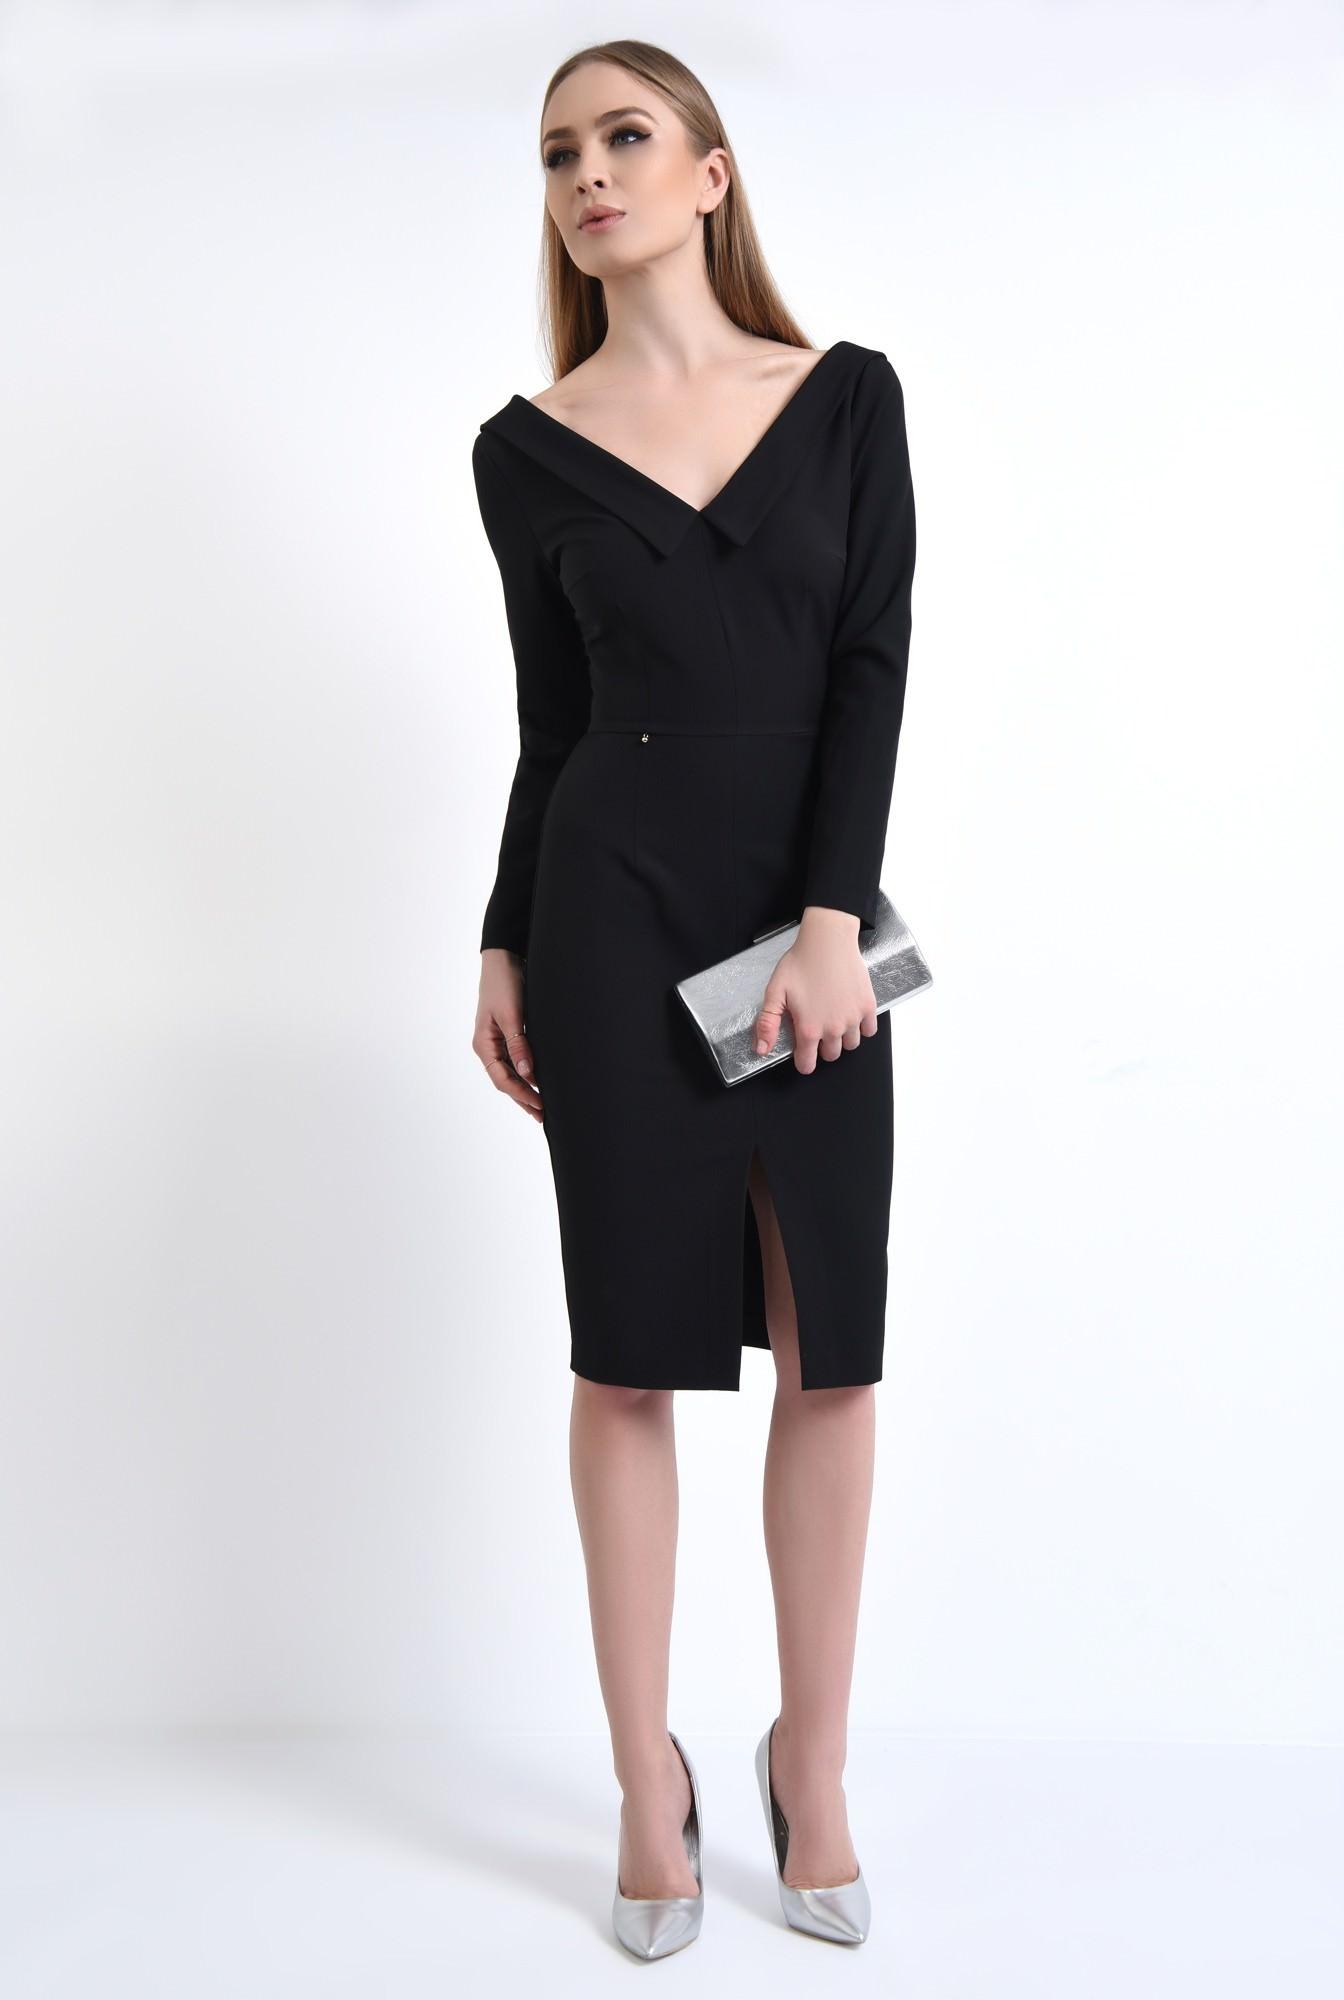 3 - Rochie eleganta neagra, midi